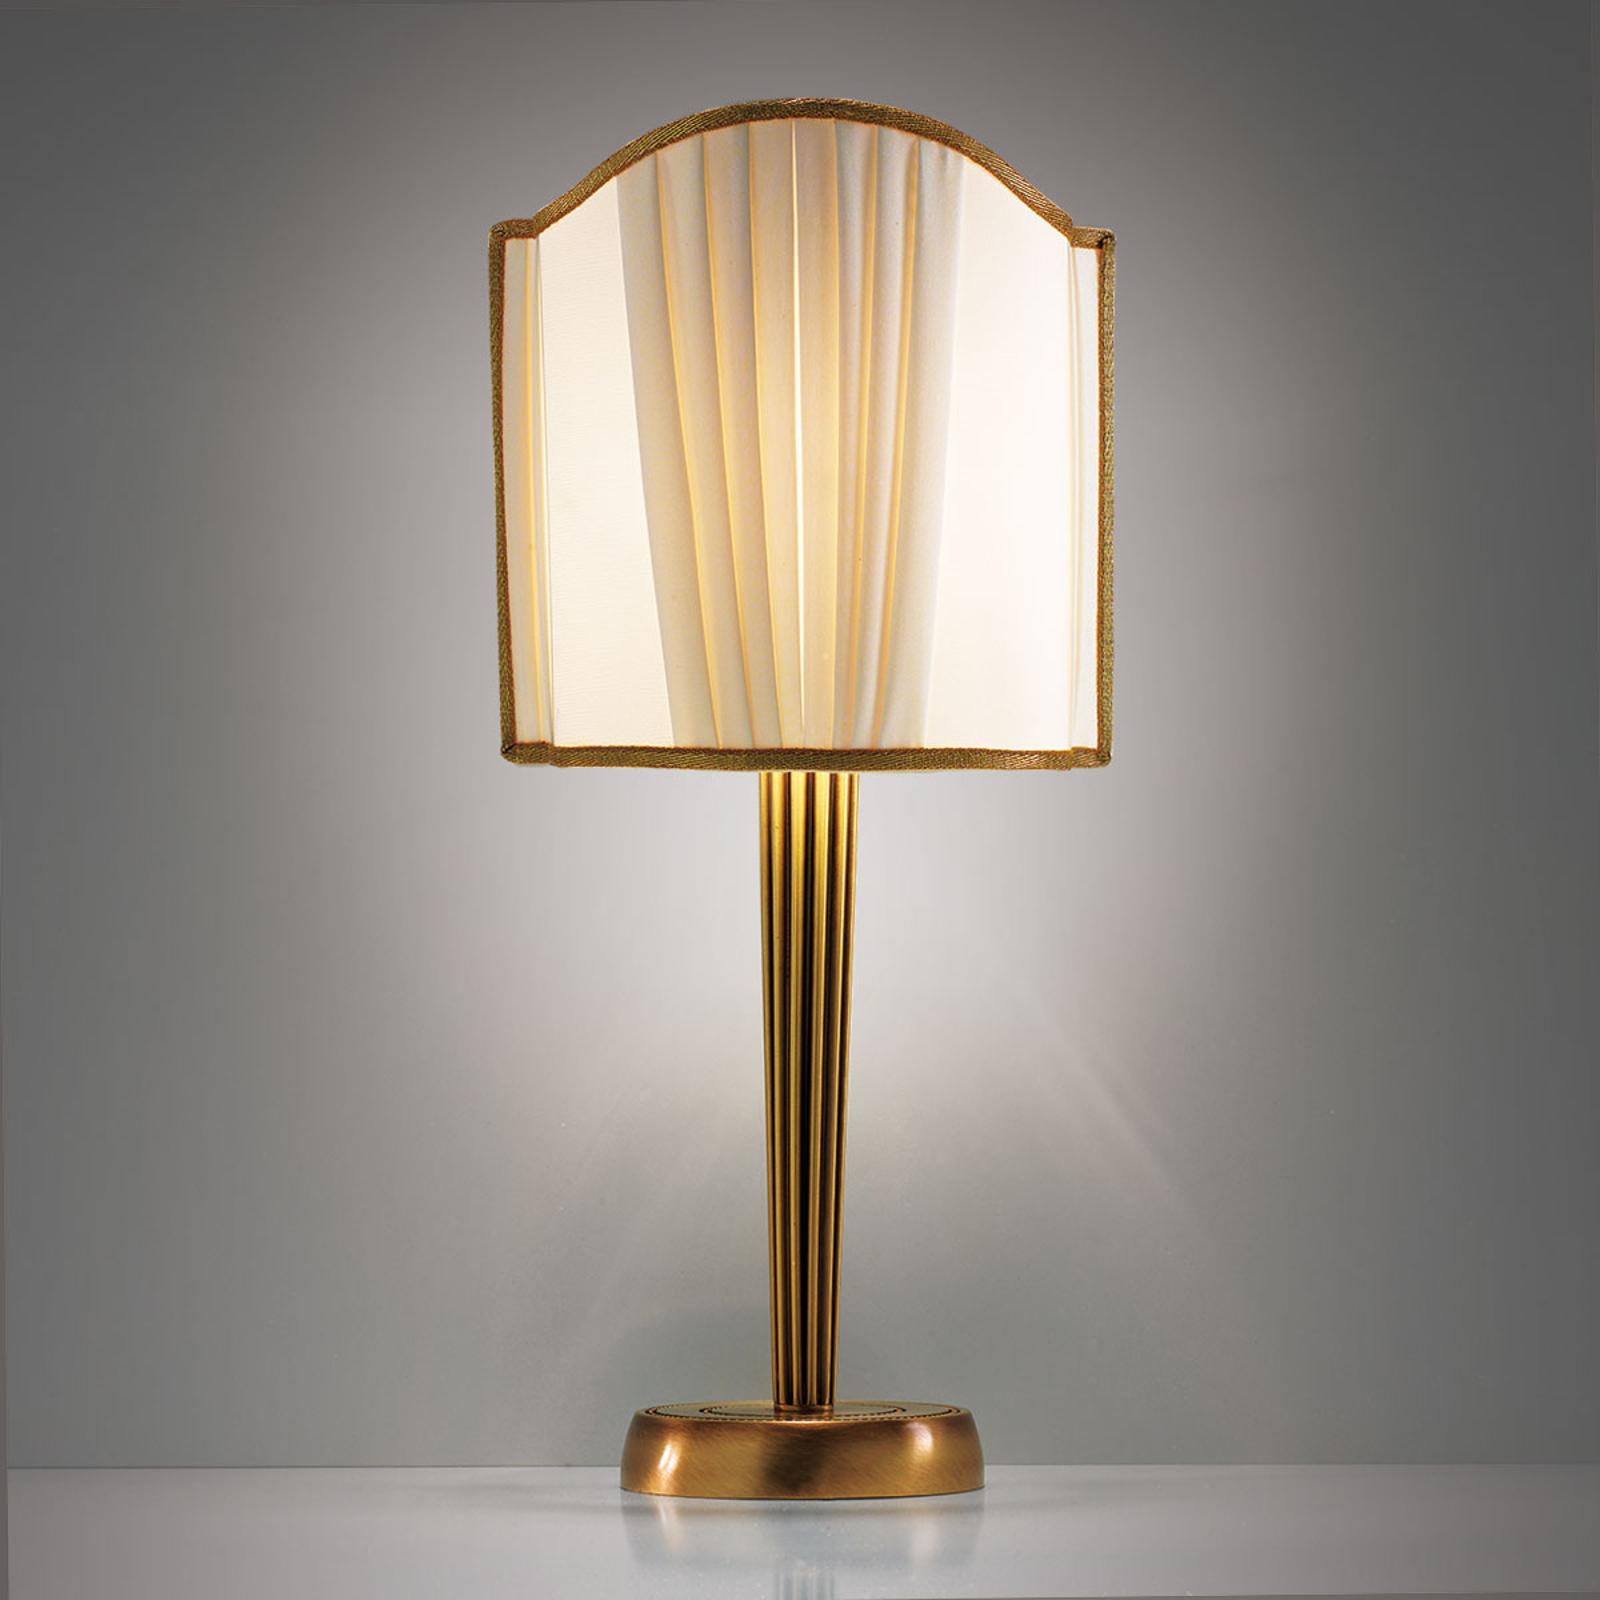 Piękna lampa stołowa Belle Epoque